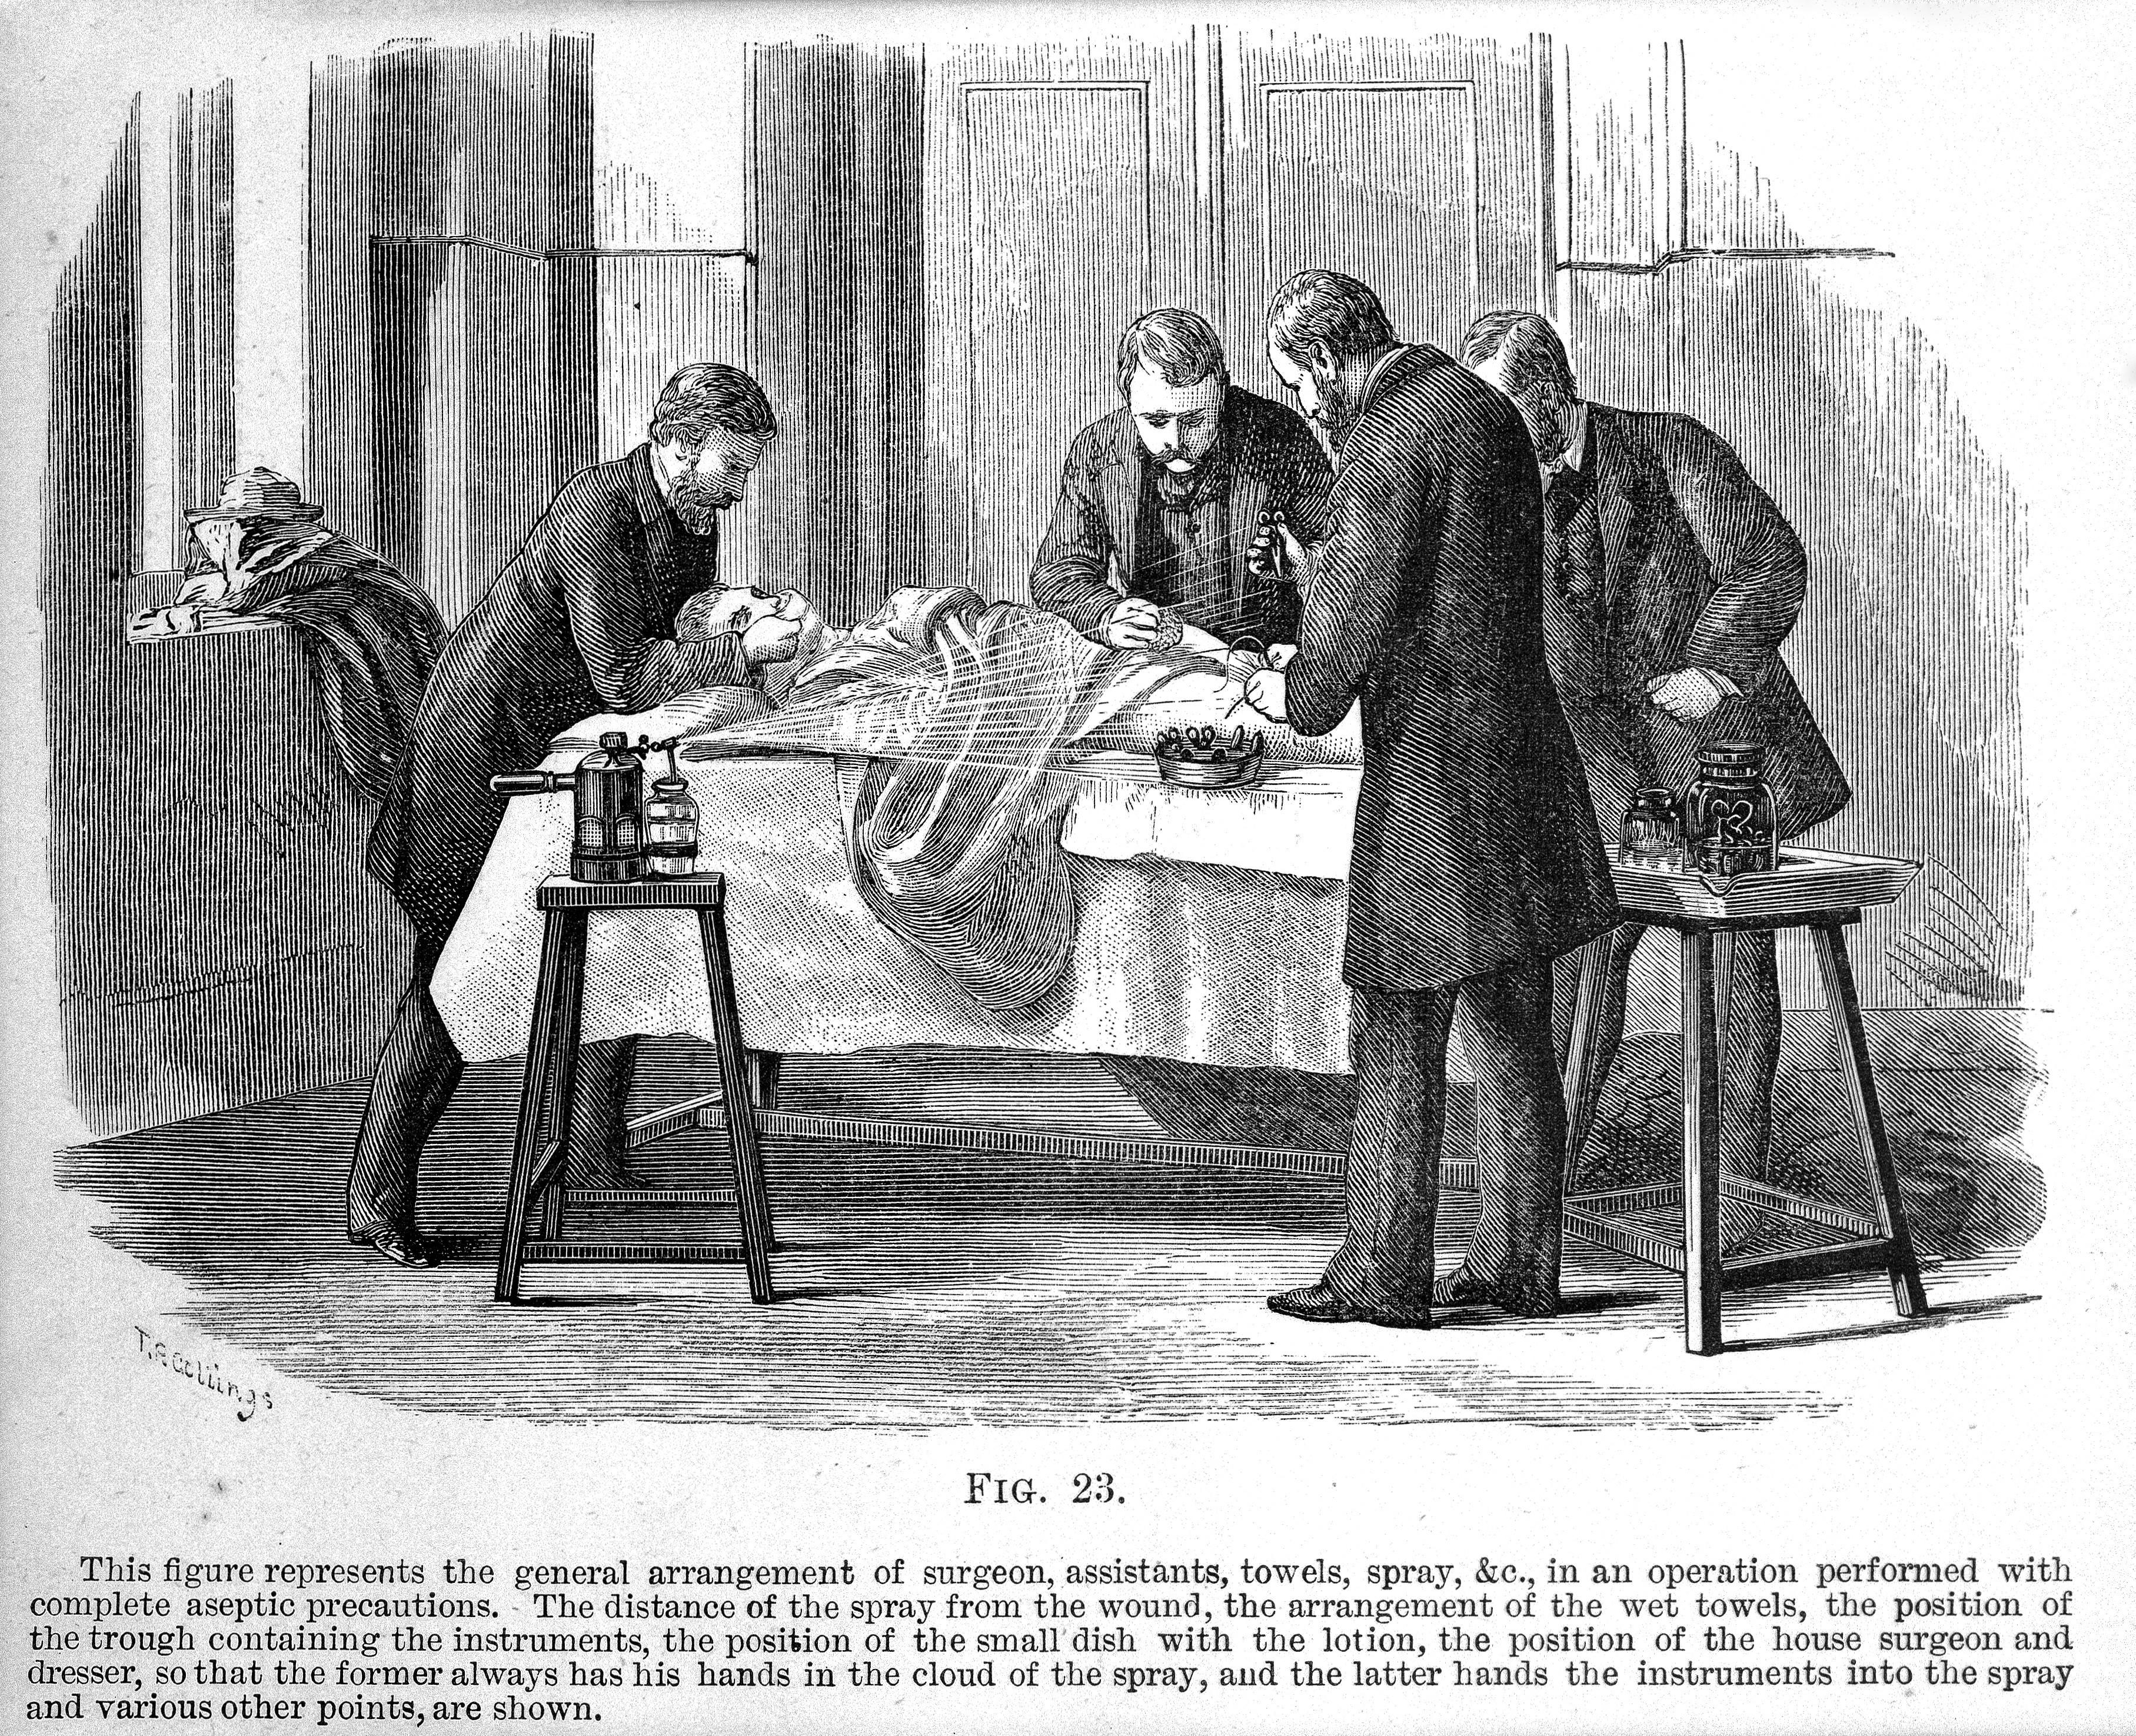 Lister 1882